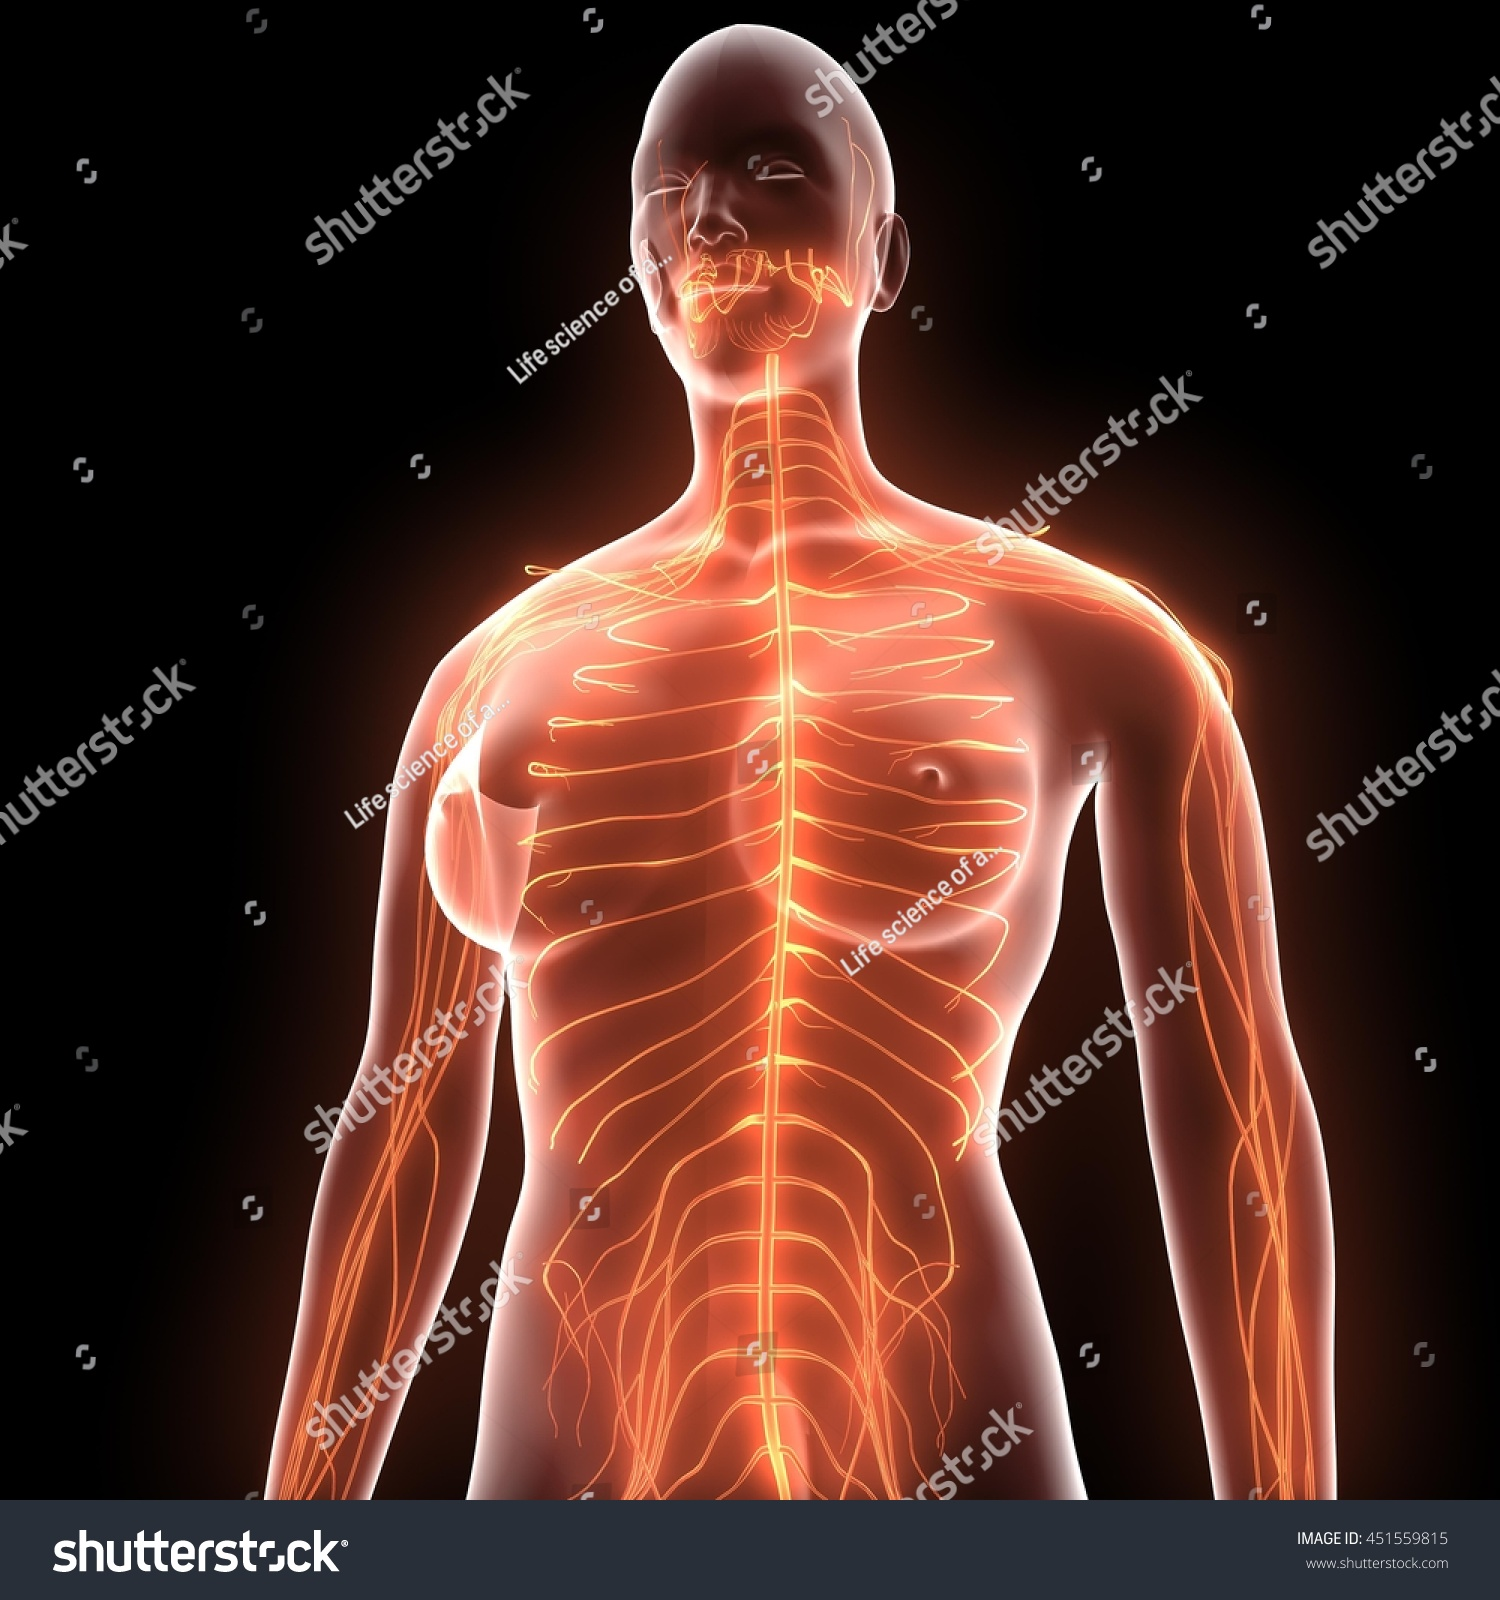 Human Body Nerves Veins Arteries Anatomy Stock Illustration